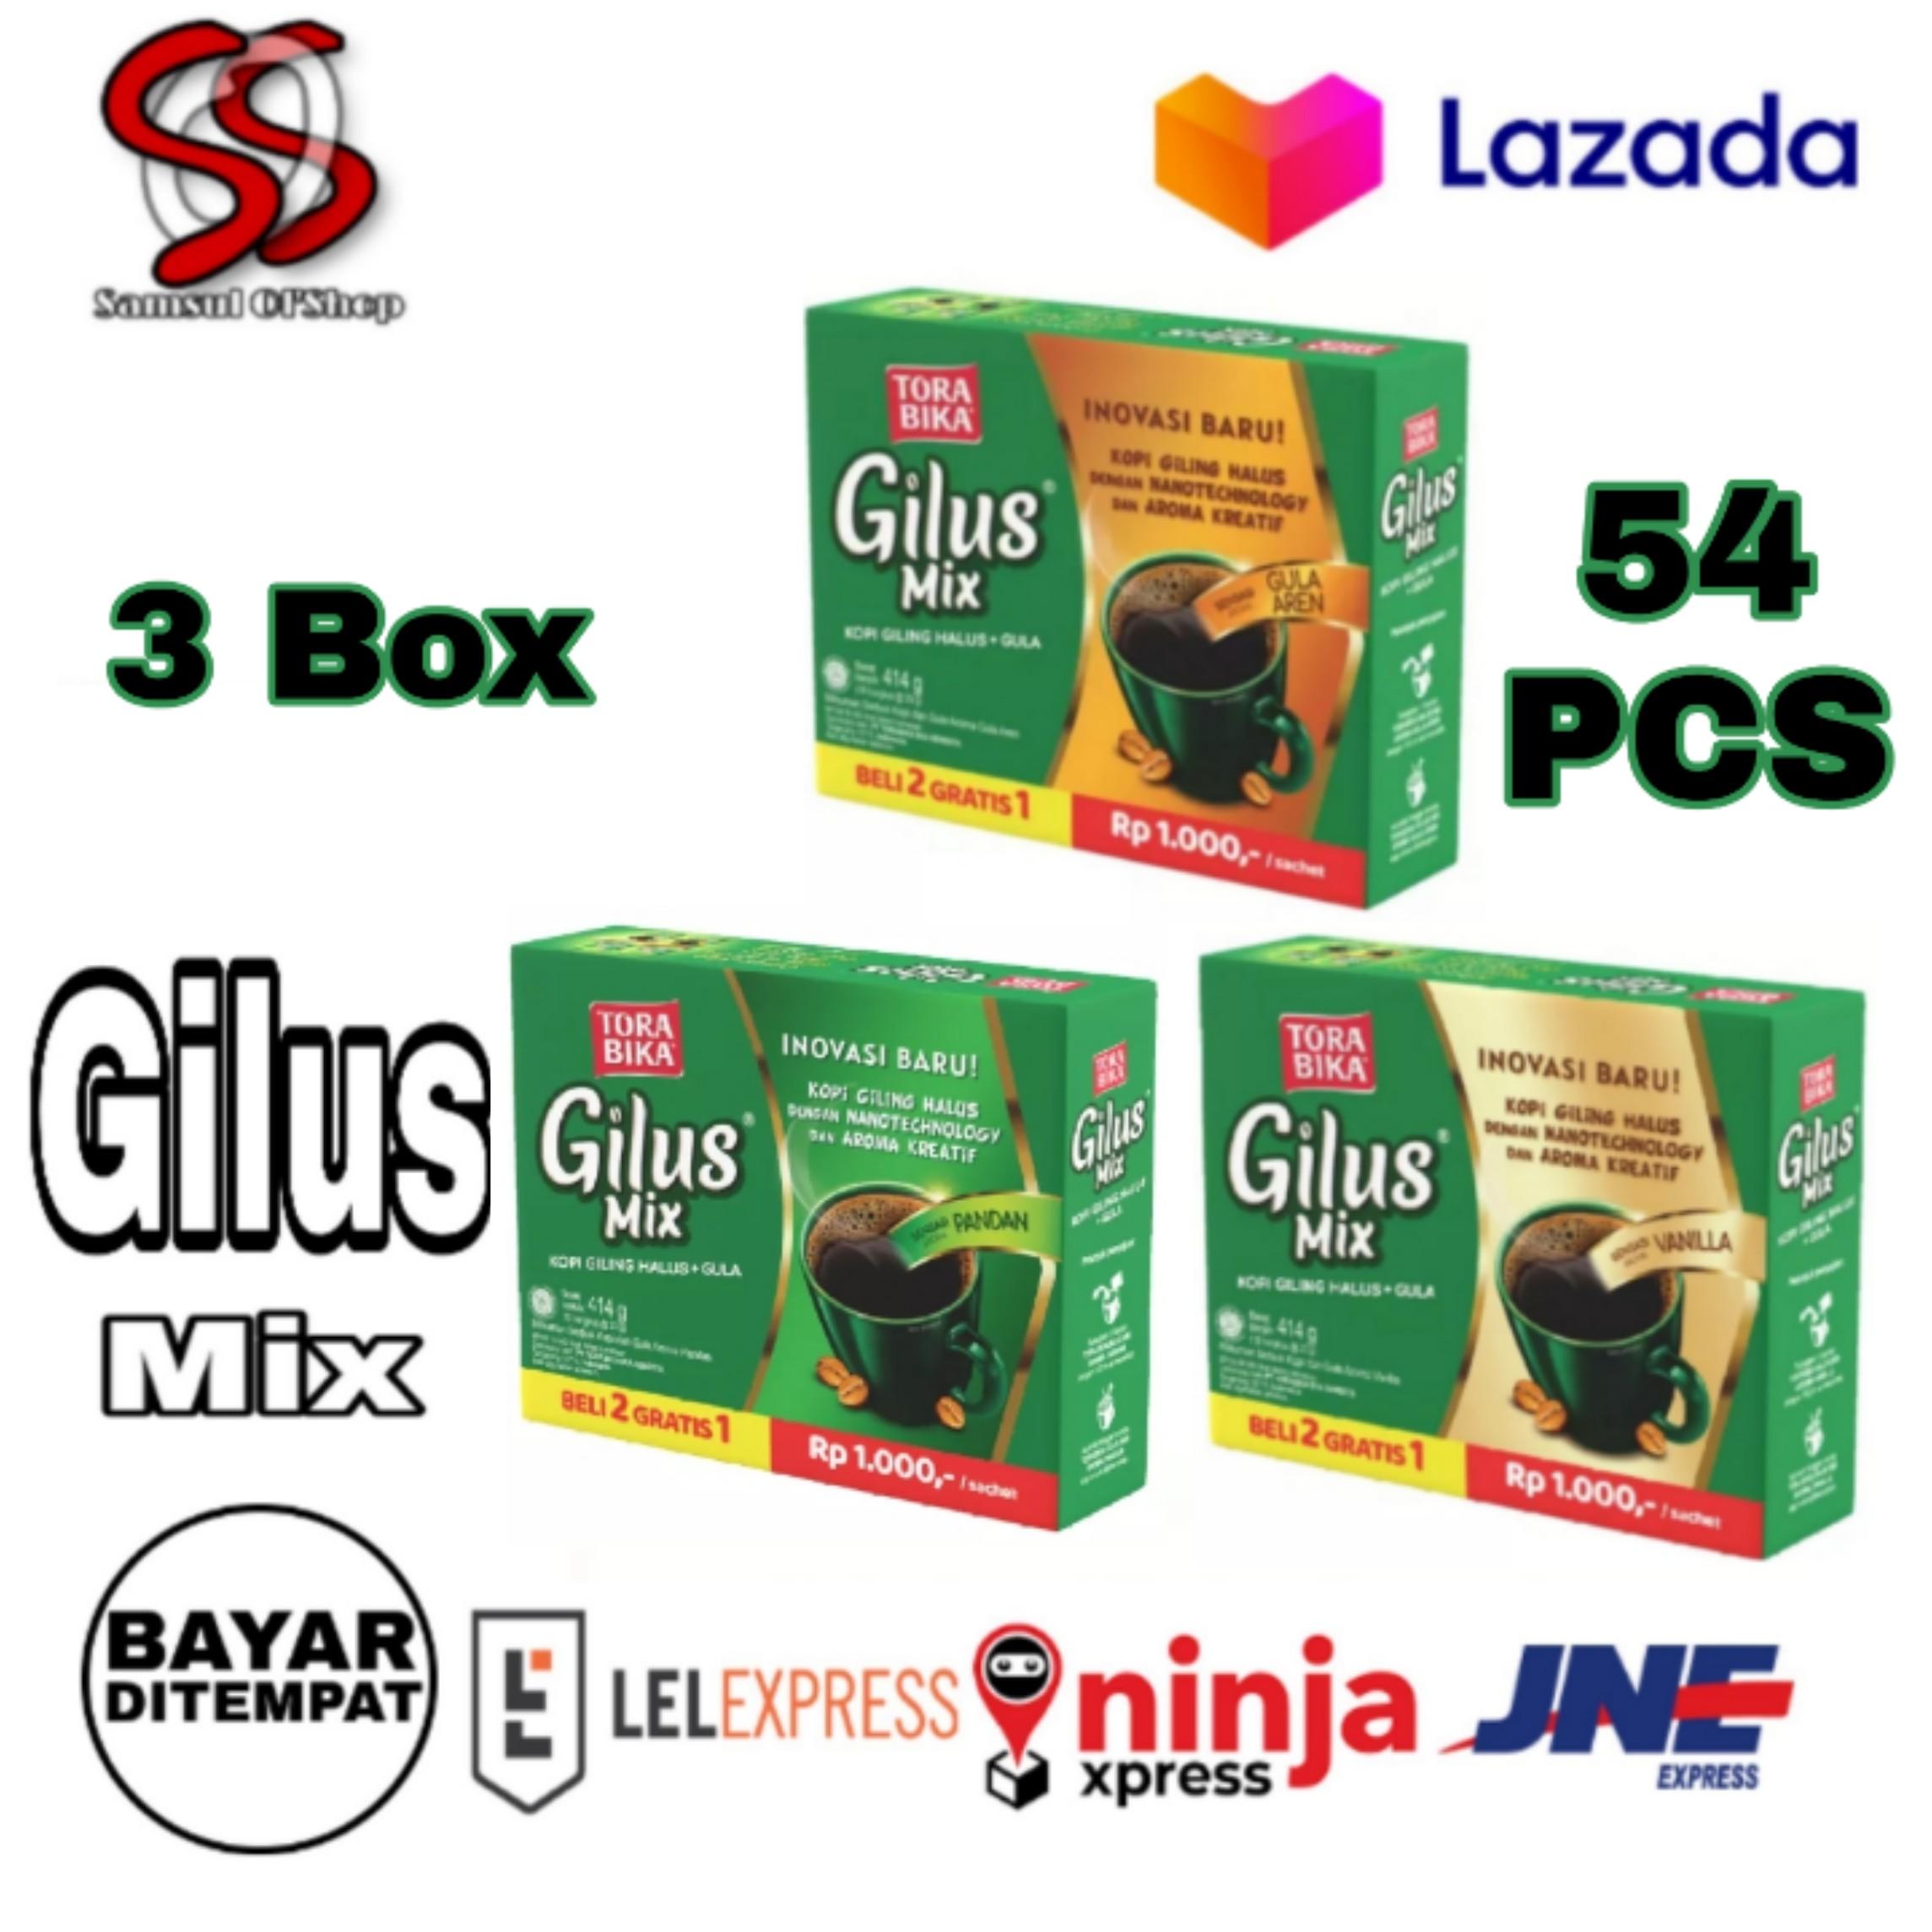 torabika kopi gilus mix box (3 rasa vanilla-gula aren-pan tiga box) kopi gilus mix isi perbox 18 sachet total 3 box isi = 54 pcs